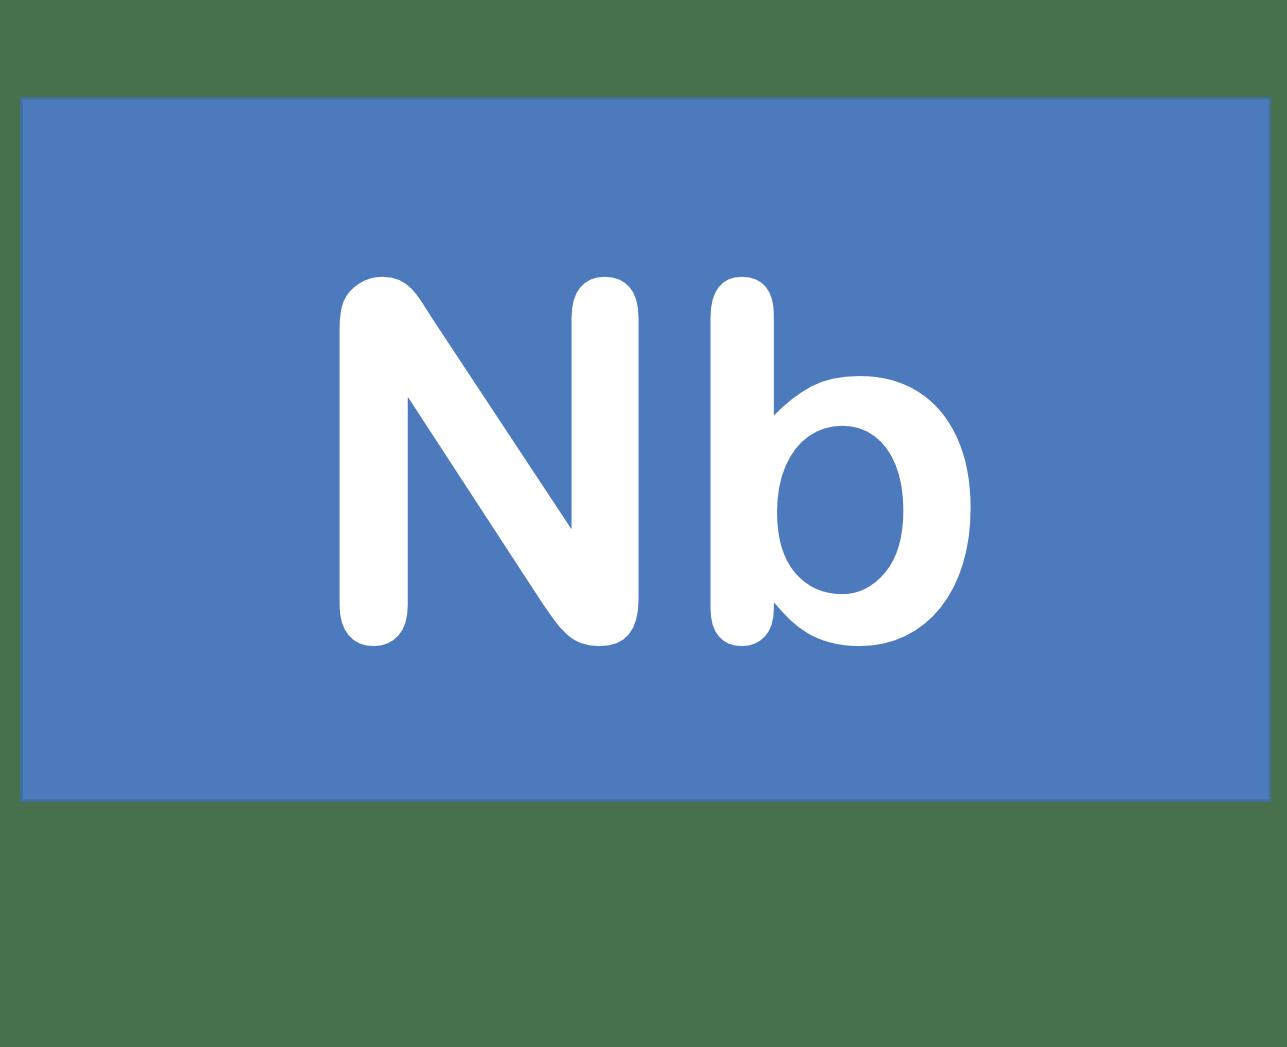 41 Nb ニオブ Niobium 元素 記号 周期表 化学 原子